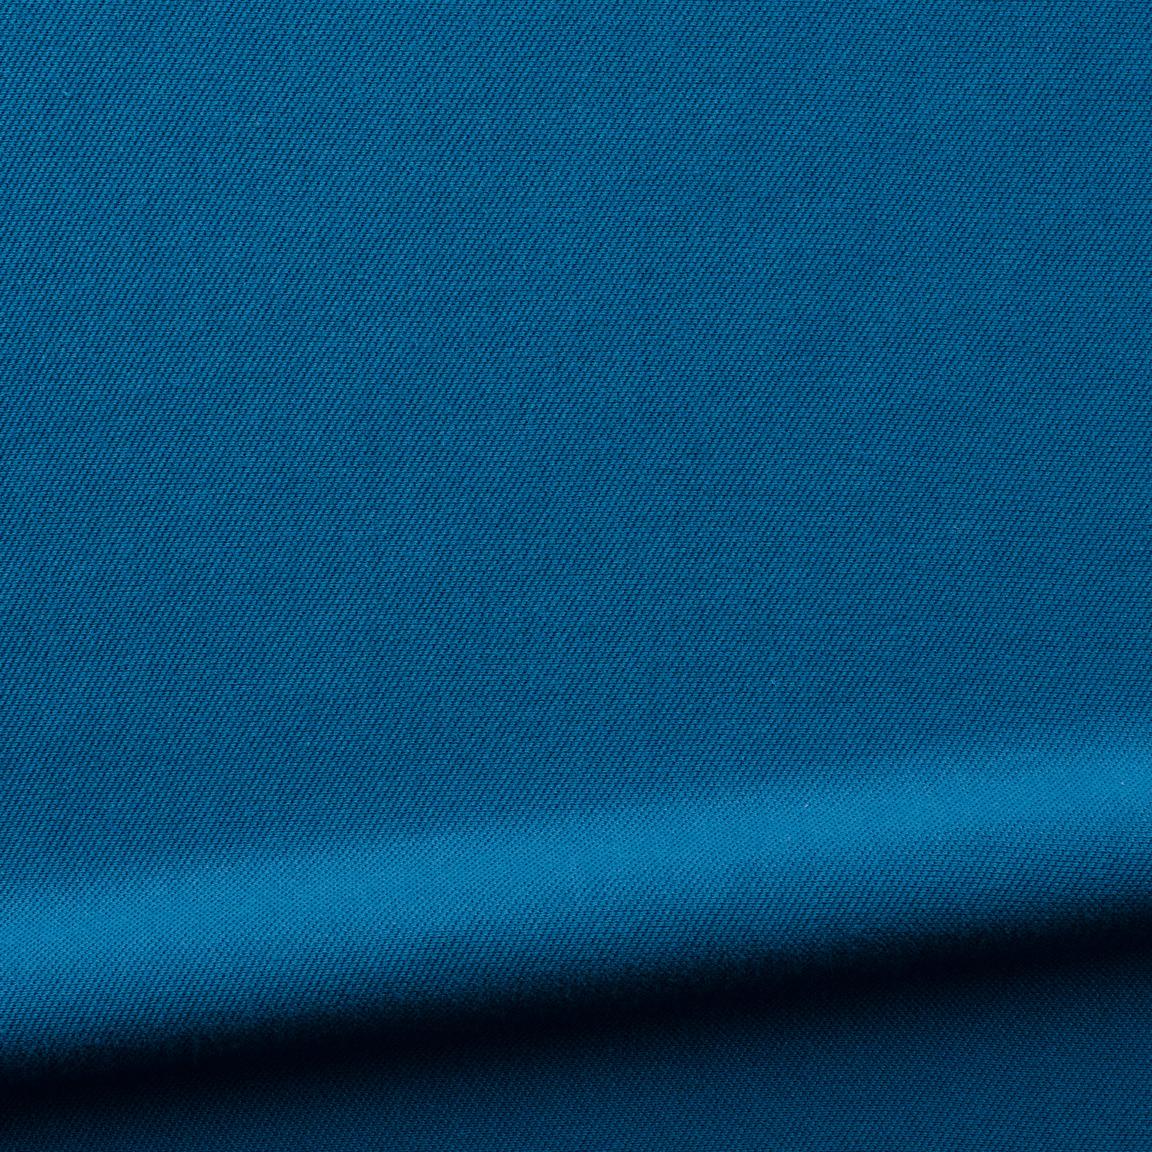 Morrocan Blue